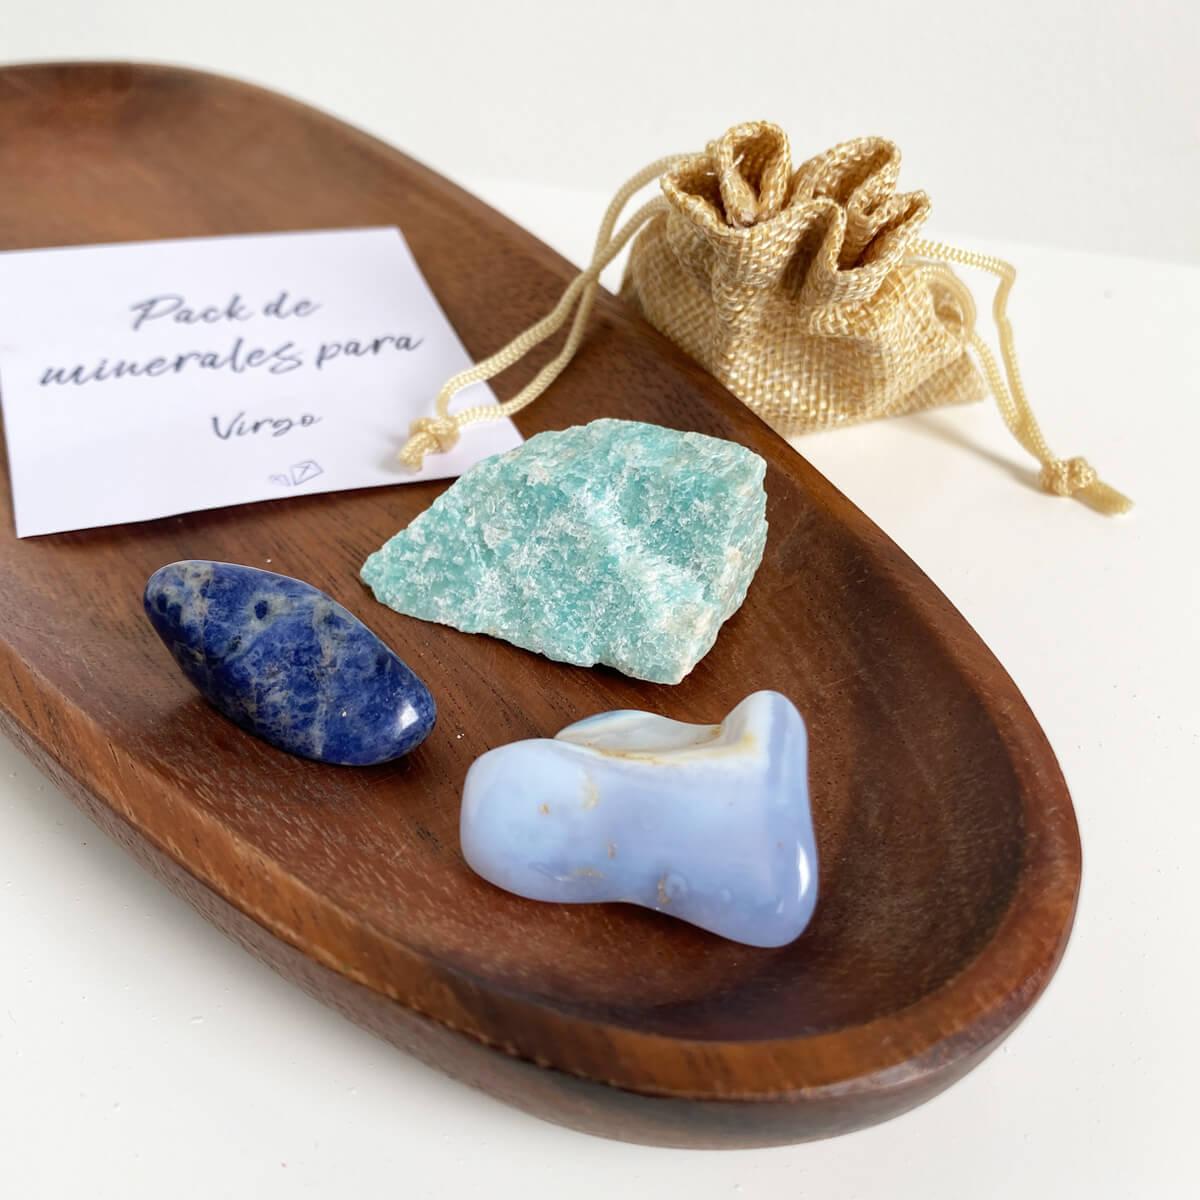 minerales para virgo